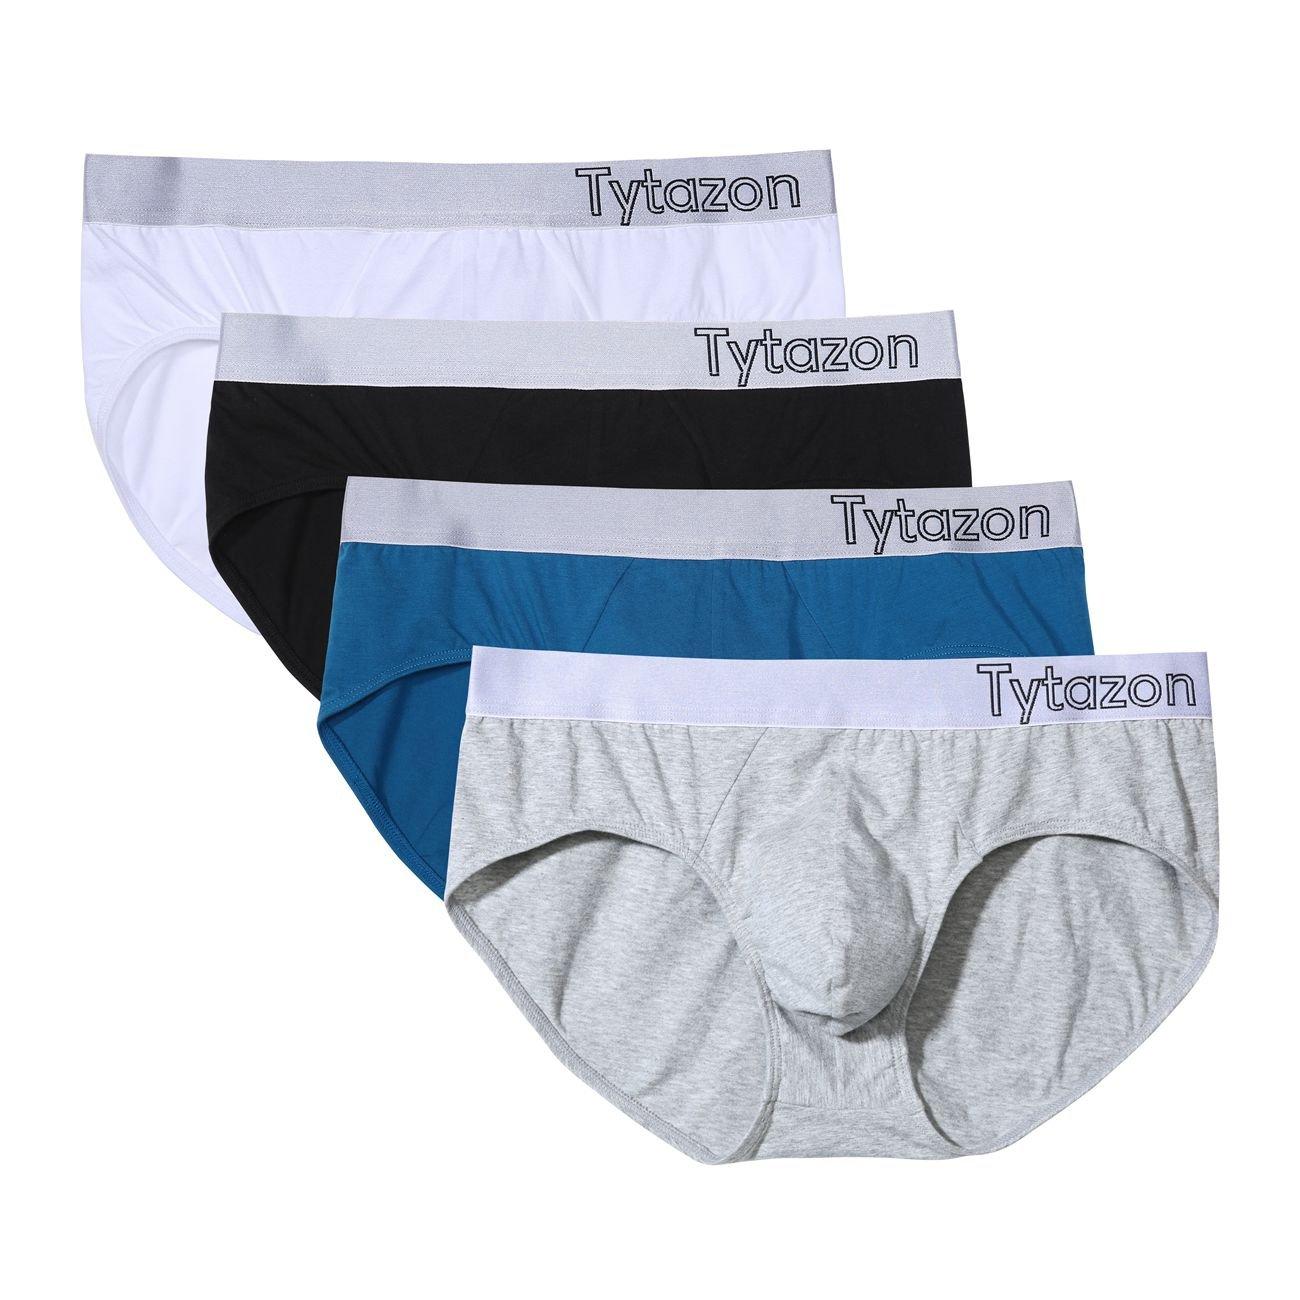 Tytazon UNDERWEAR メンズ B078XDFXT1 X-Large|マルチカラー マルチカラー X-Large